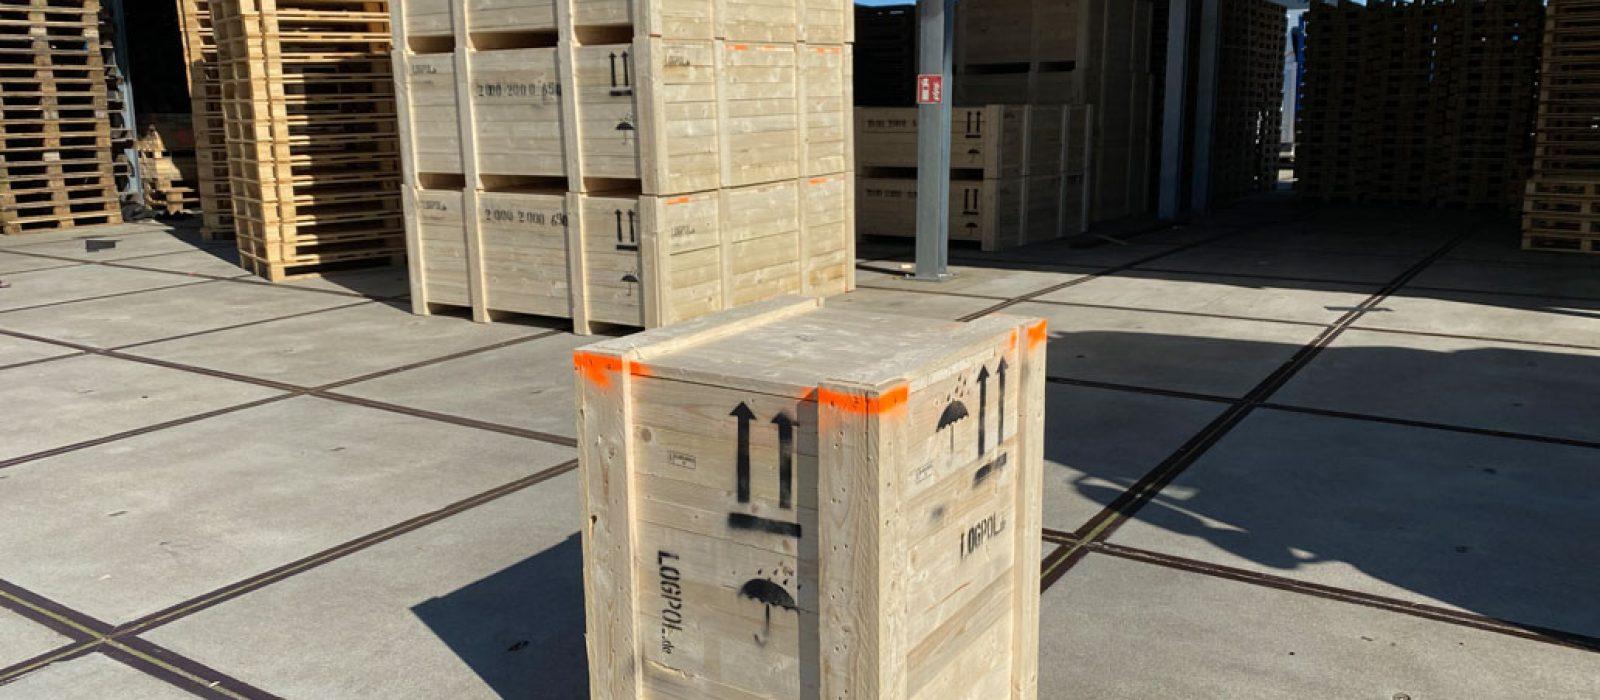 Kiste-600x600x800-mm-LOGPOL